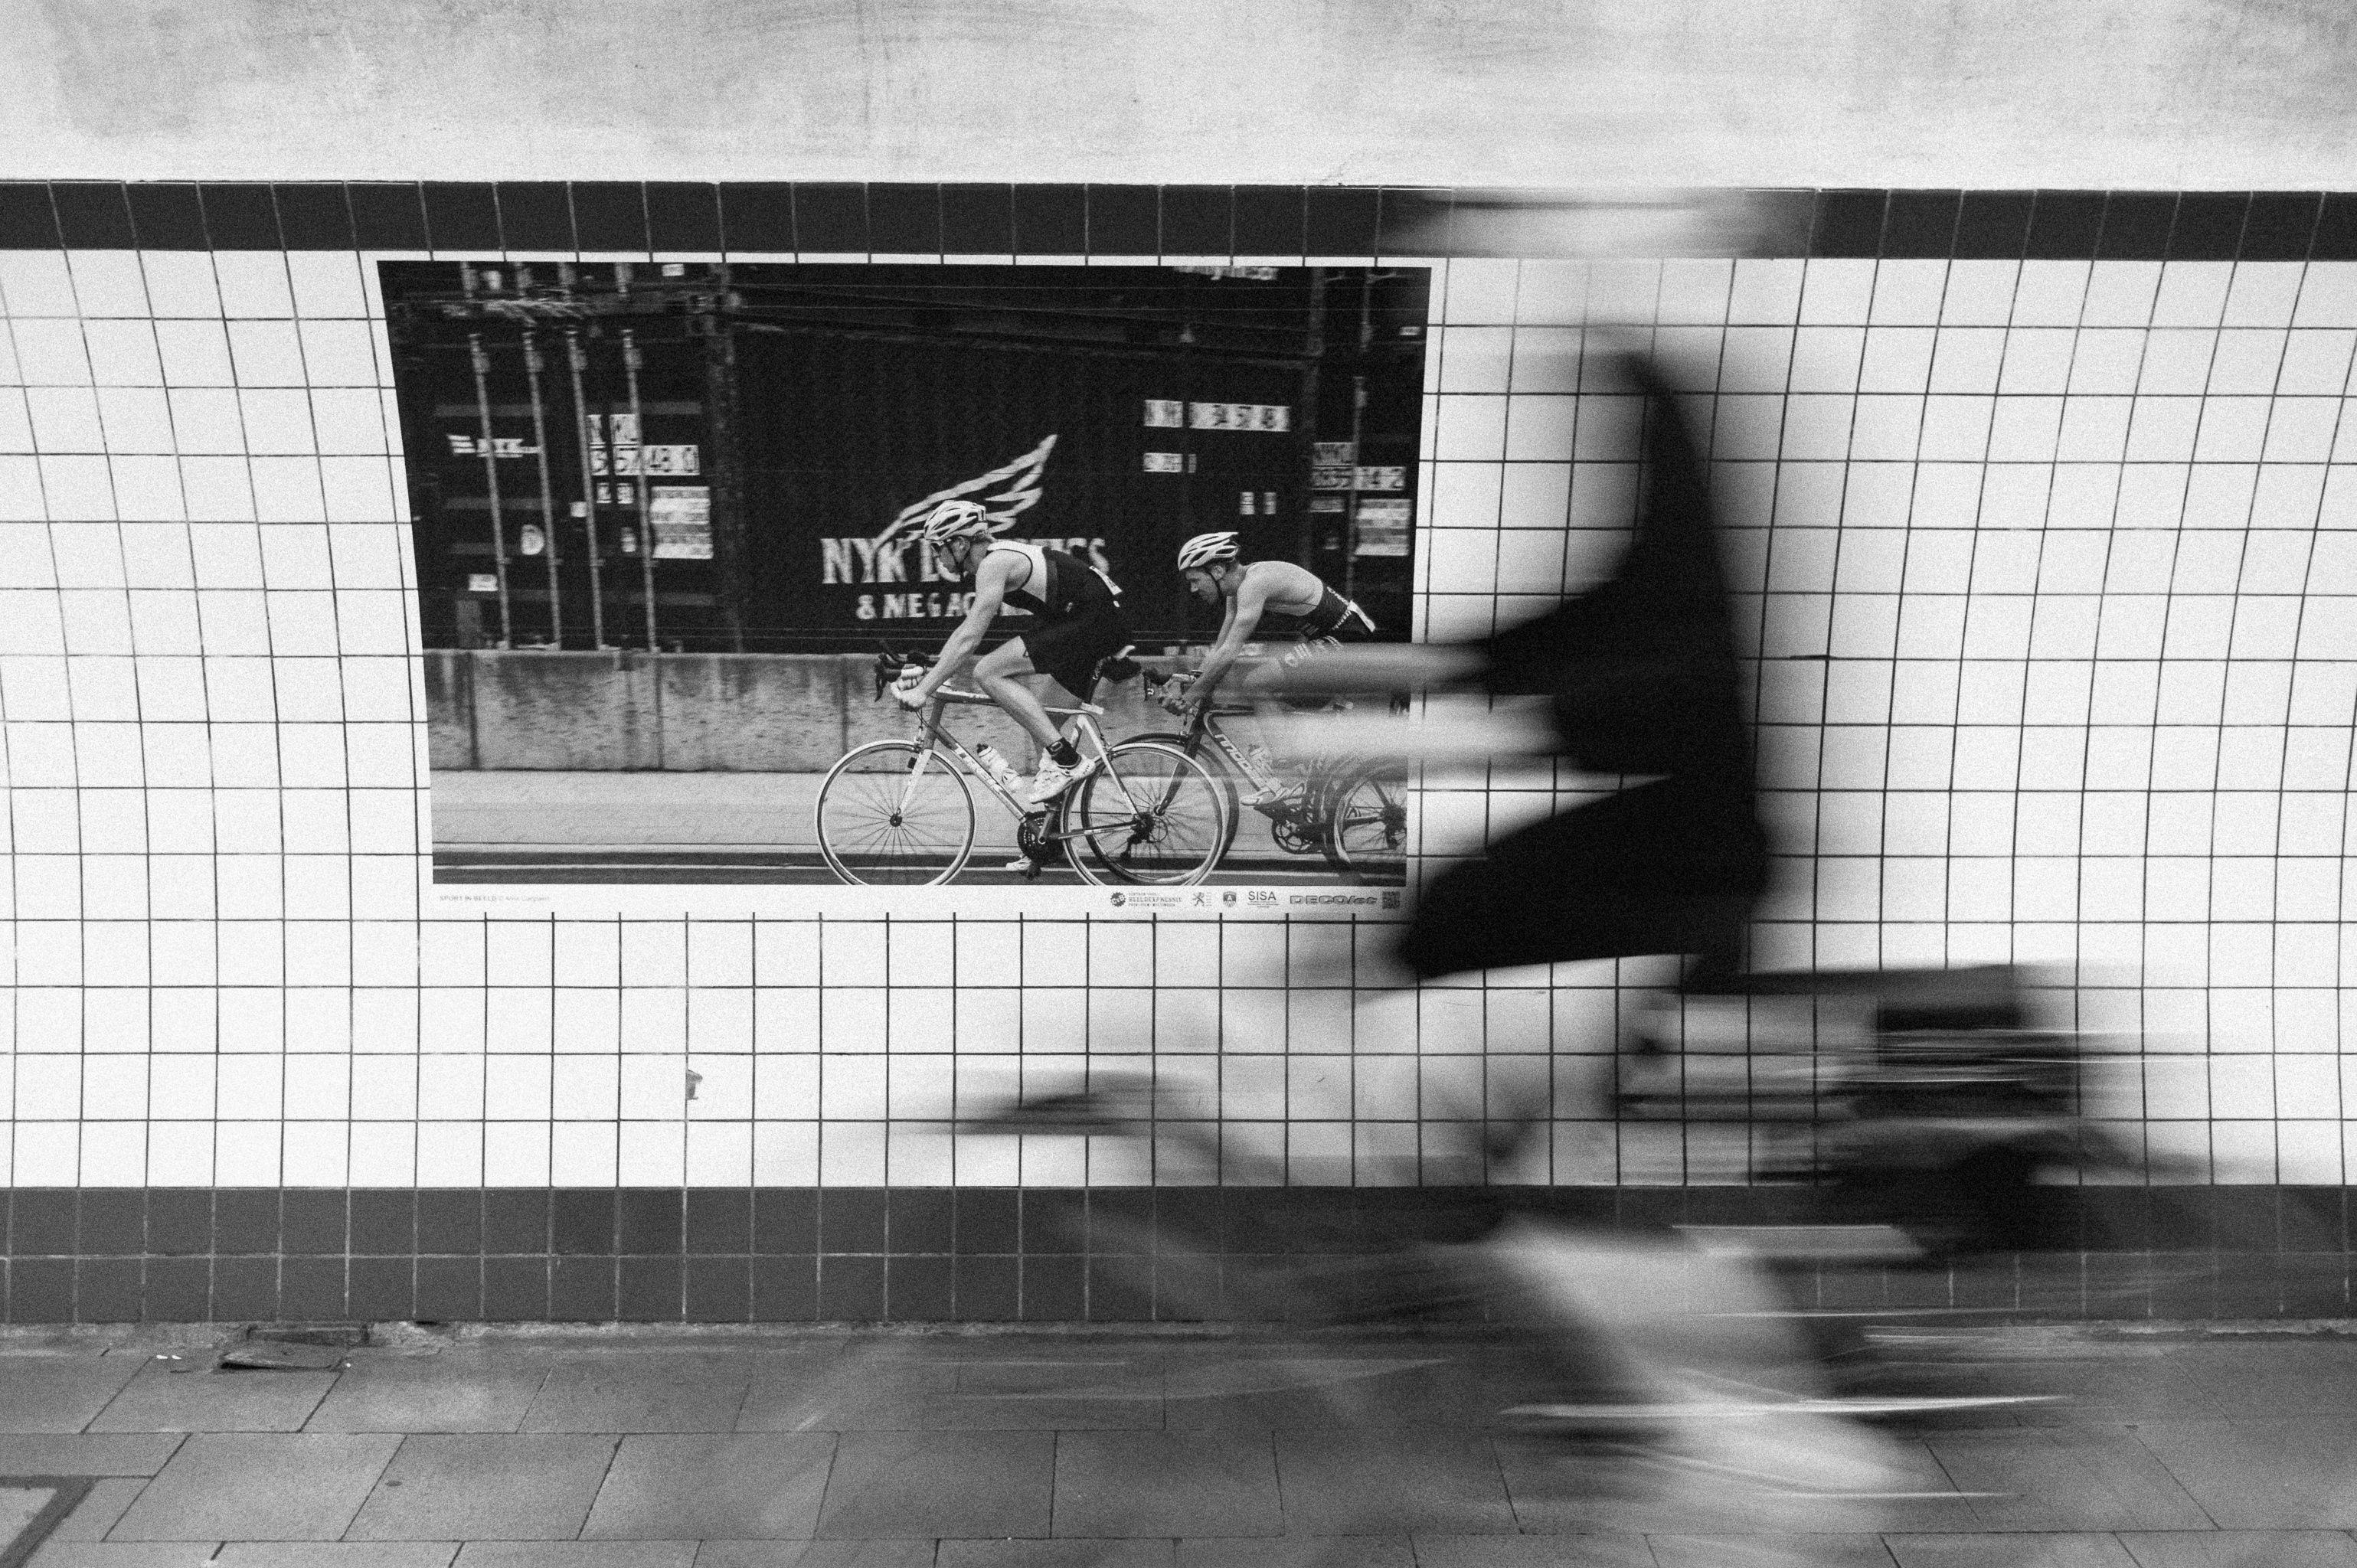 antwerp_pedestrian_tunnel_belgium_leica_m9p_summicron_35mm_asph_jipvankuijk